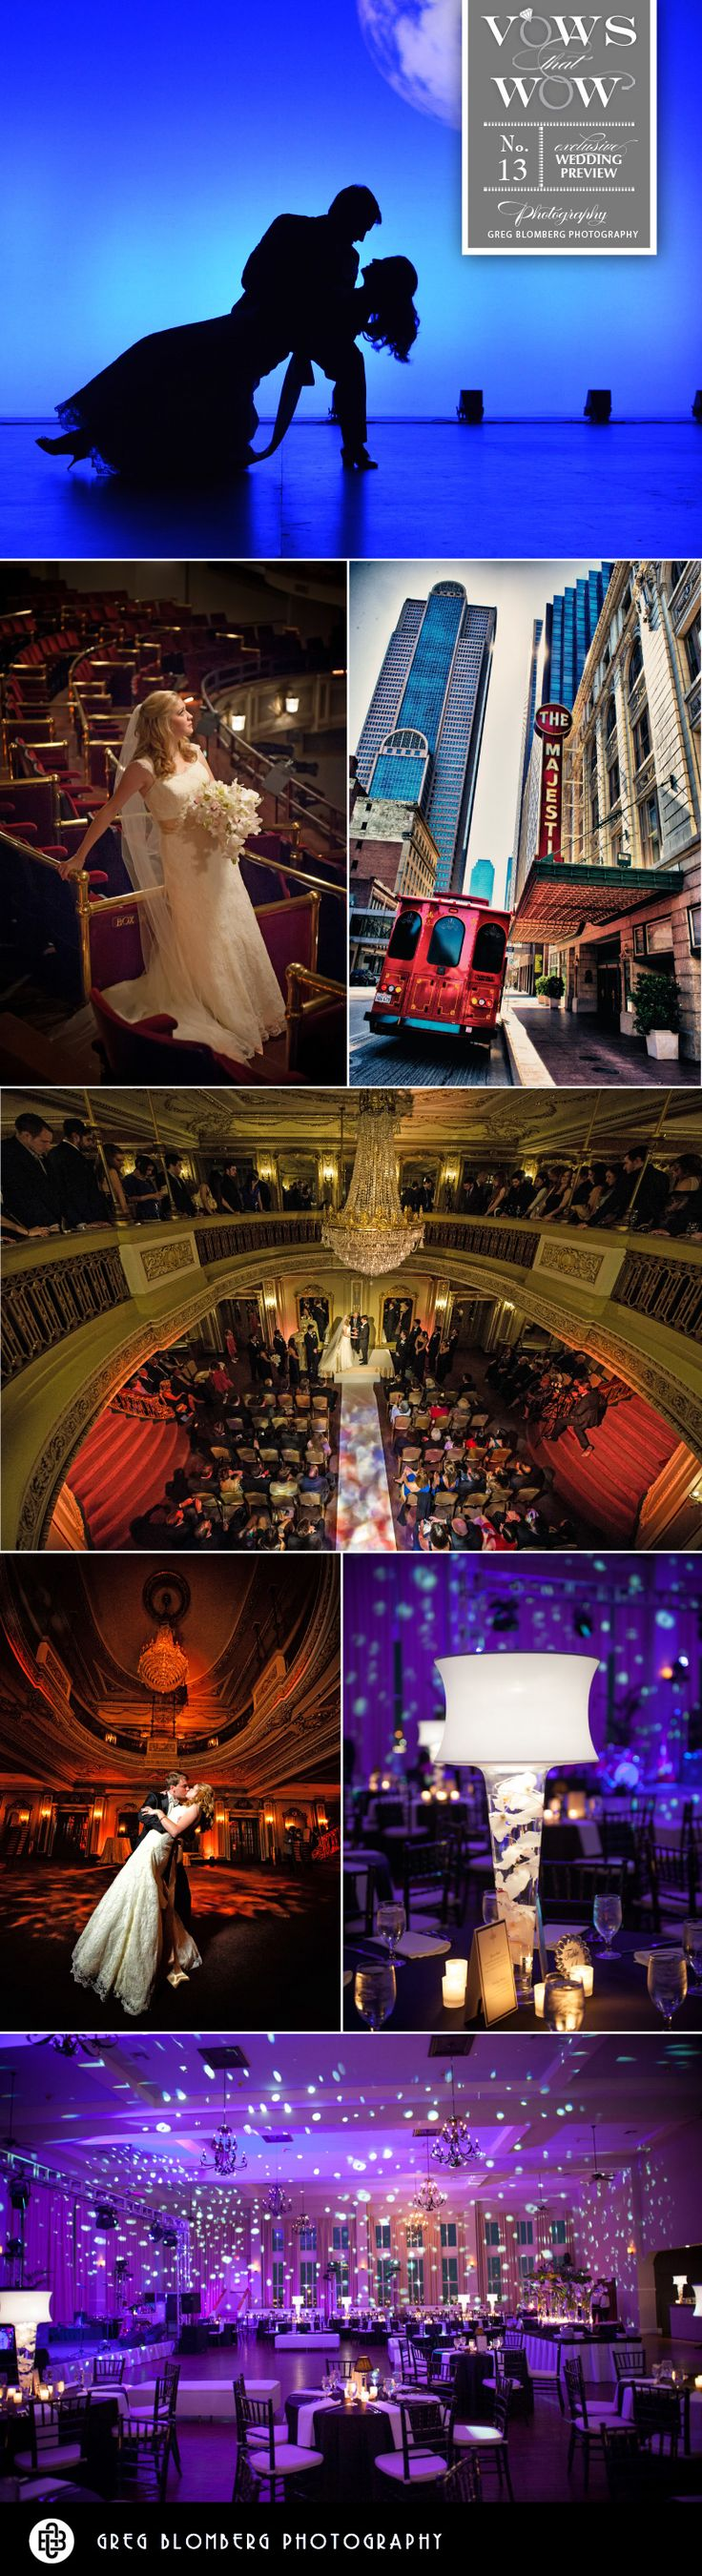 17 Best Ideas About Theatre Wedding On Pinterest